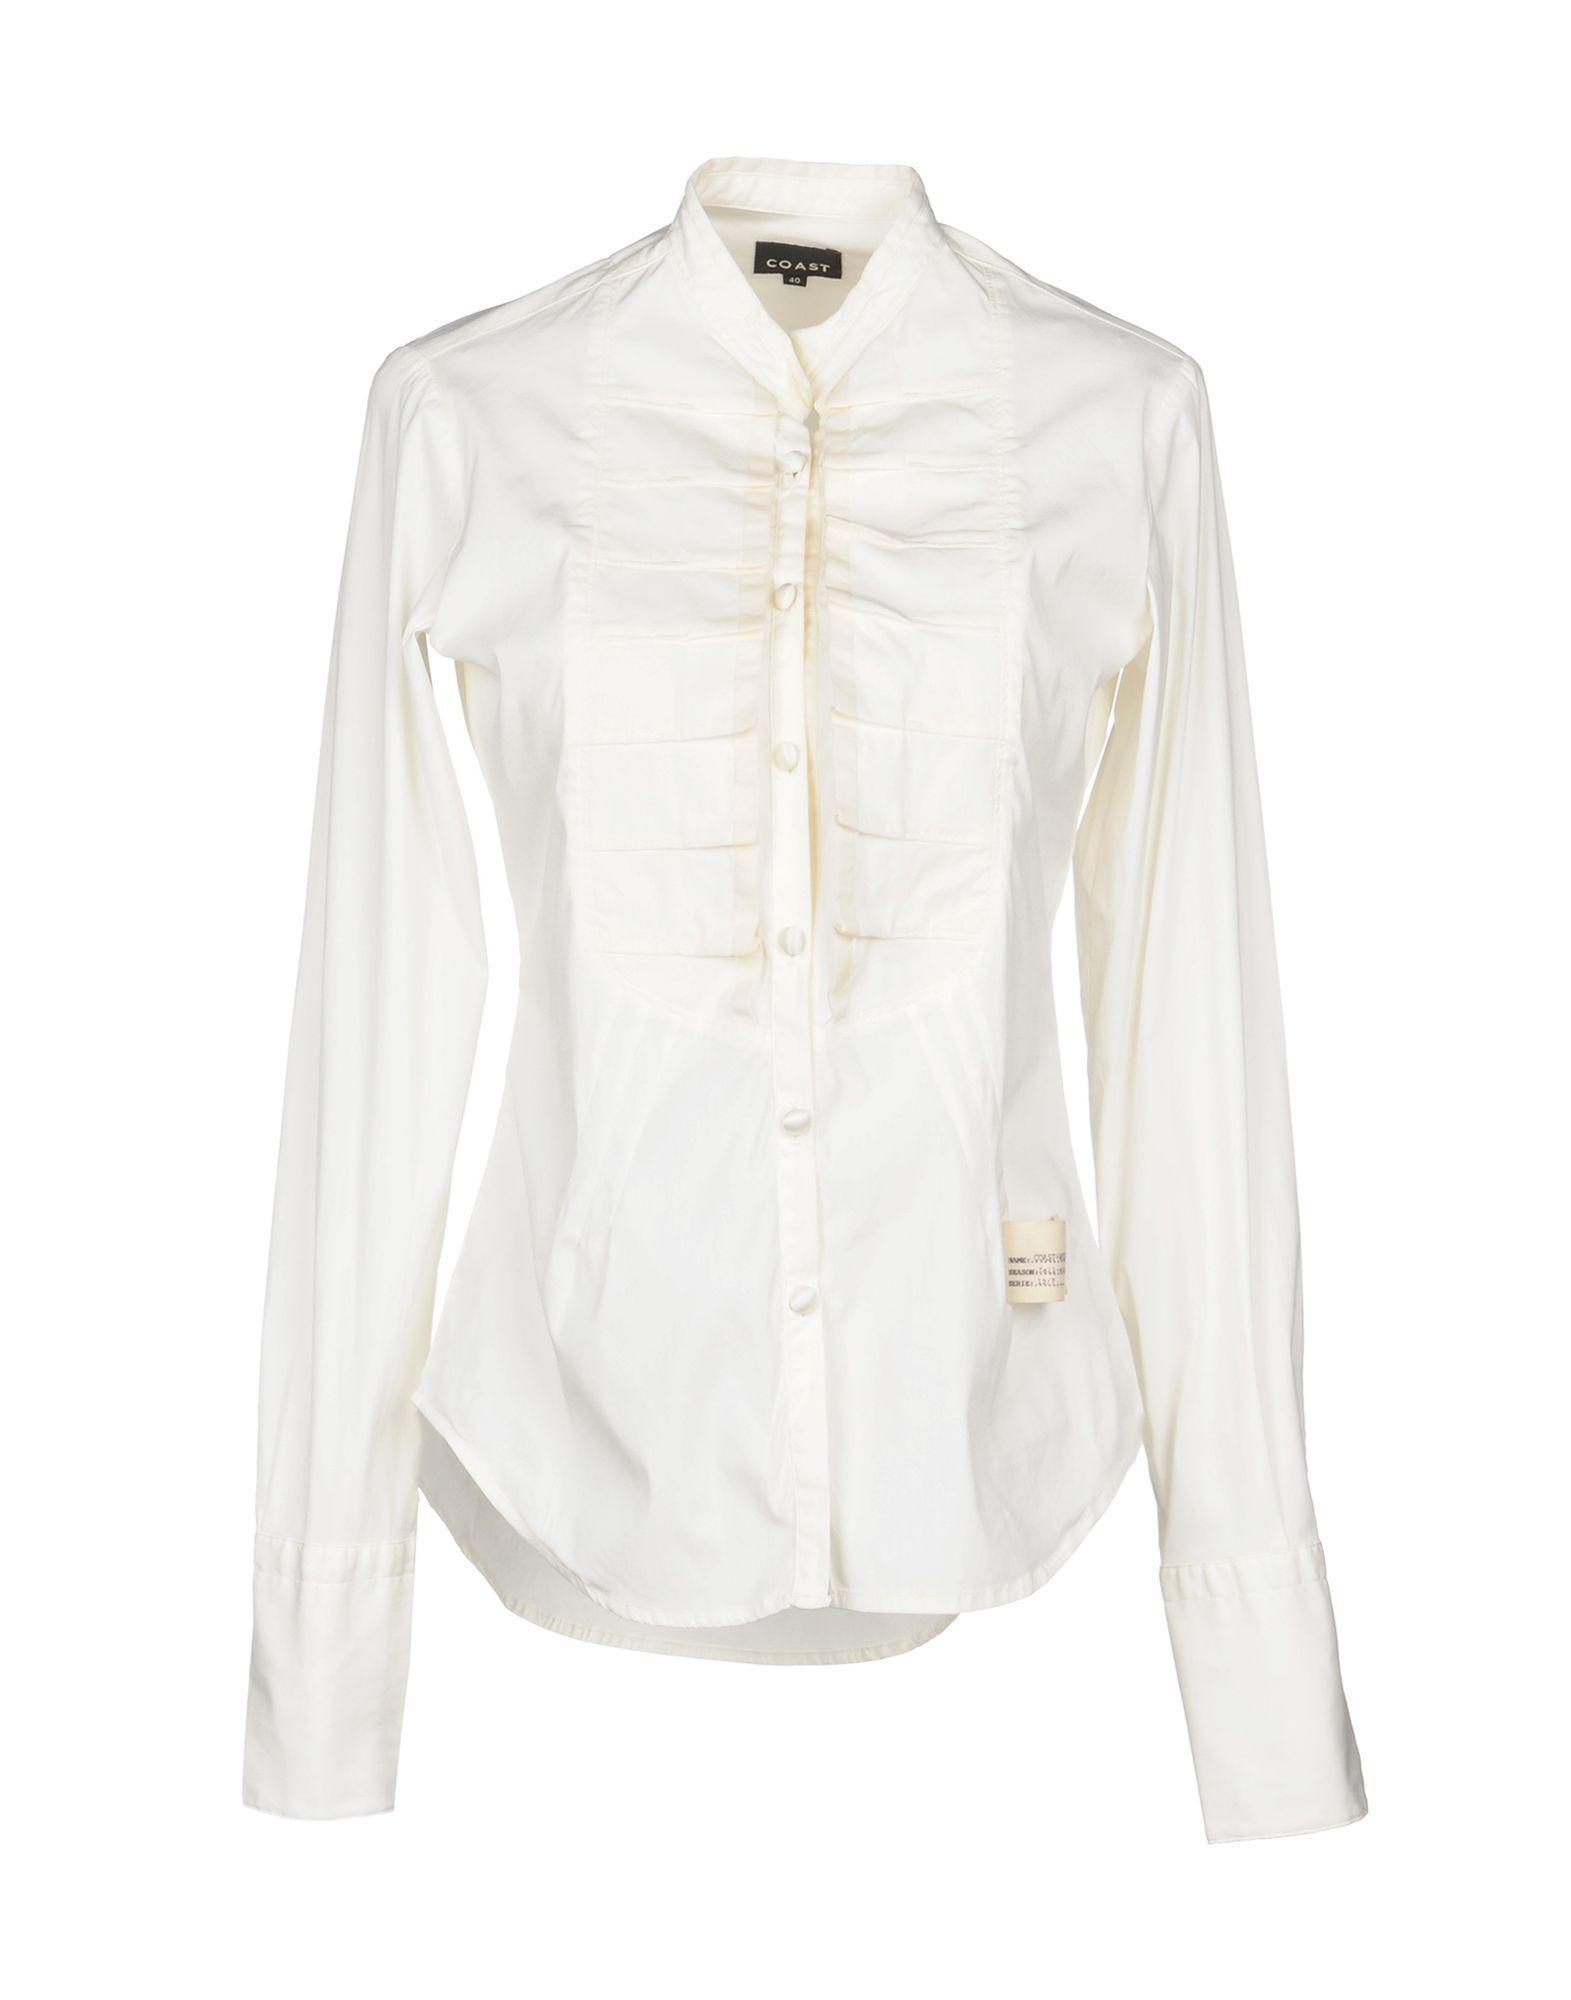 Blusas Para Luce Perfecta Tops Siempre Y Camisas Mujer Bella dvqPnw